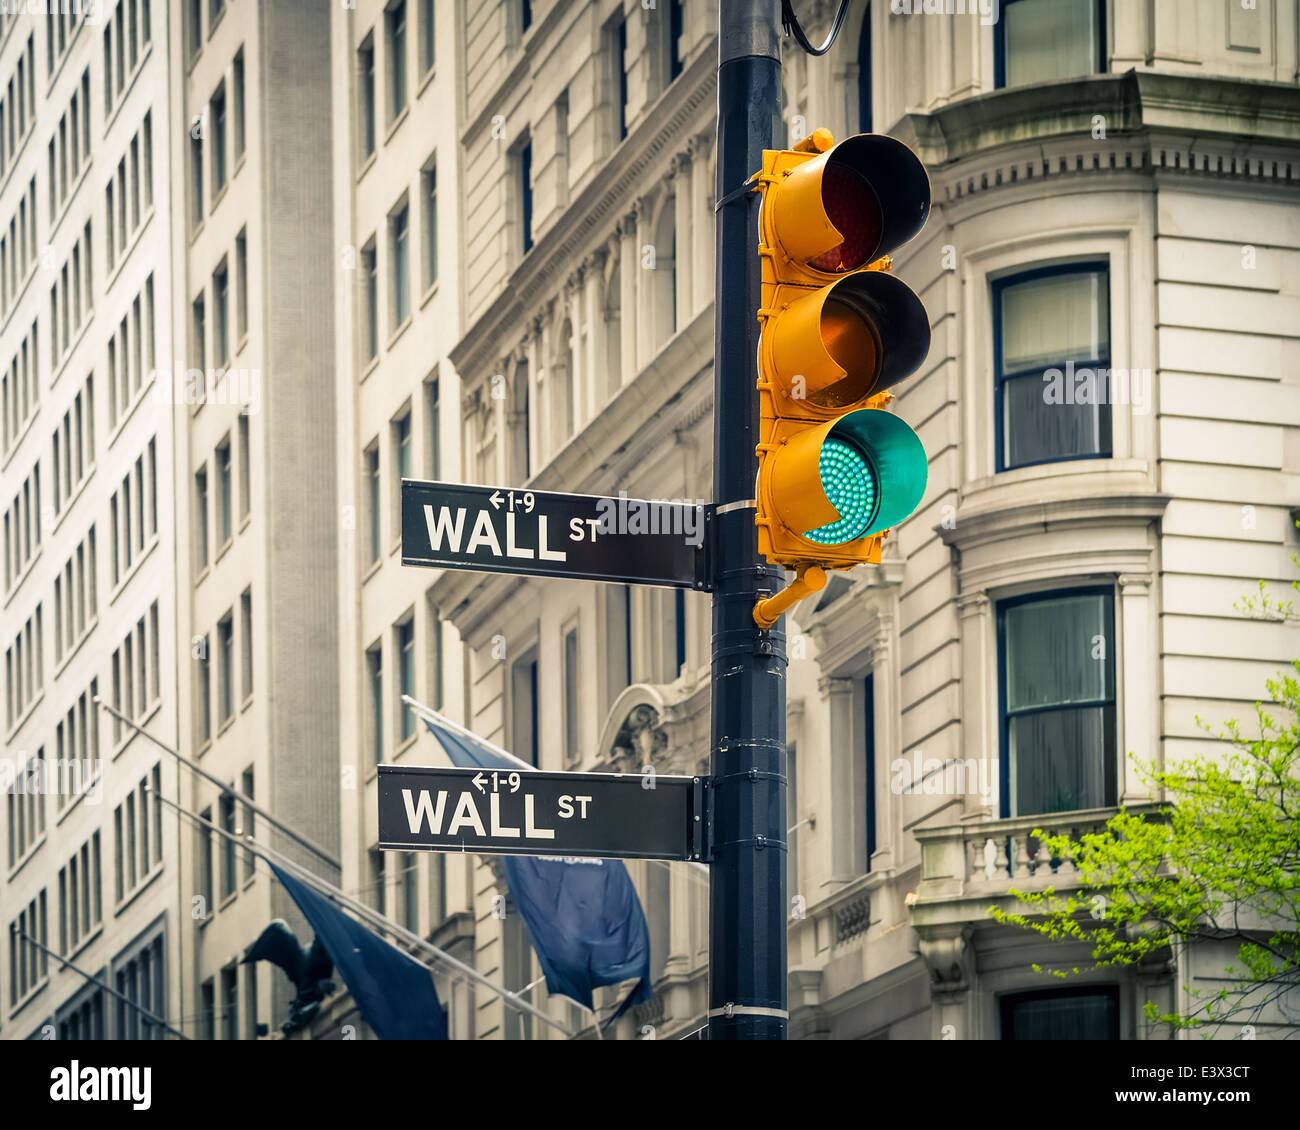 Wall street, New York - Stock Image